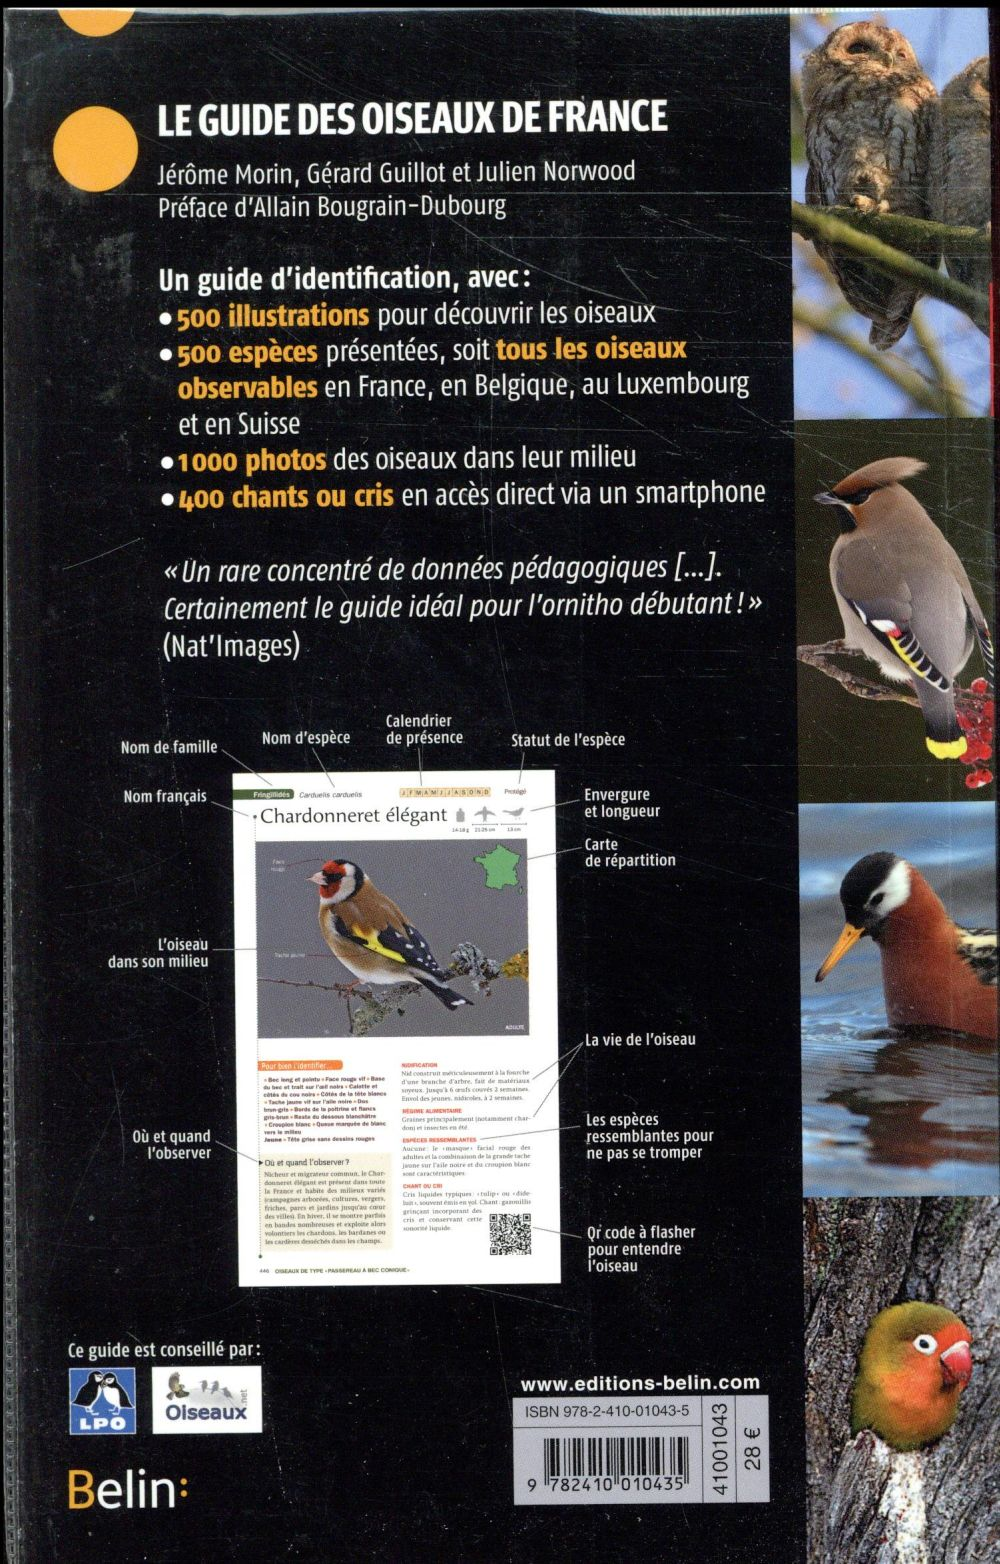 Guide Des Oiseaux De France : guide, oiseaux, france, Guide, Oiseaux, France, (édition, 2017), Jérôme, Morin,, Gérard, Guillot,, Julien, Norwood, Belin, Grand, Format, Livre, Fête, FIGEAC